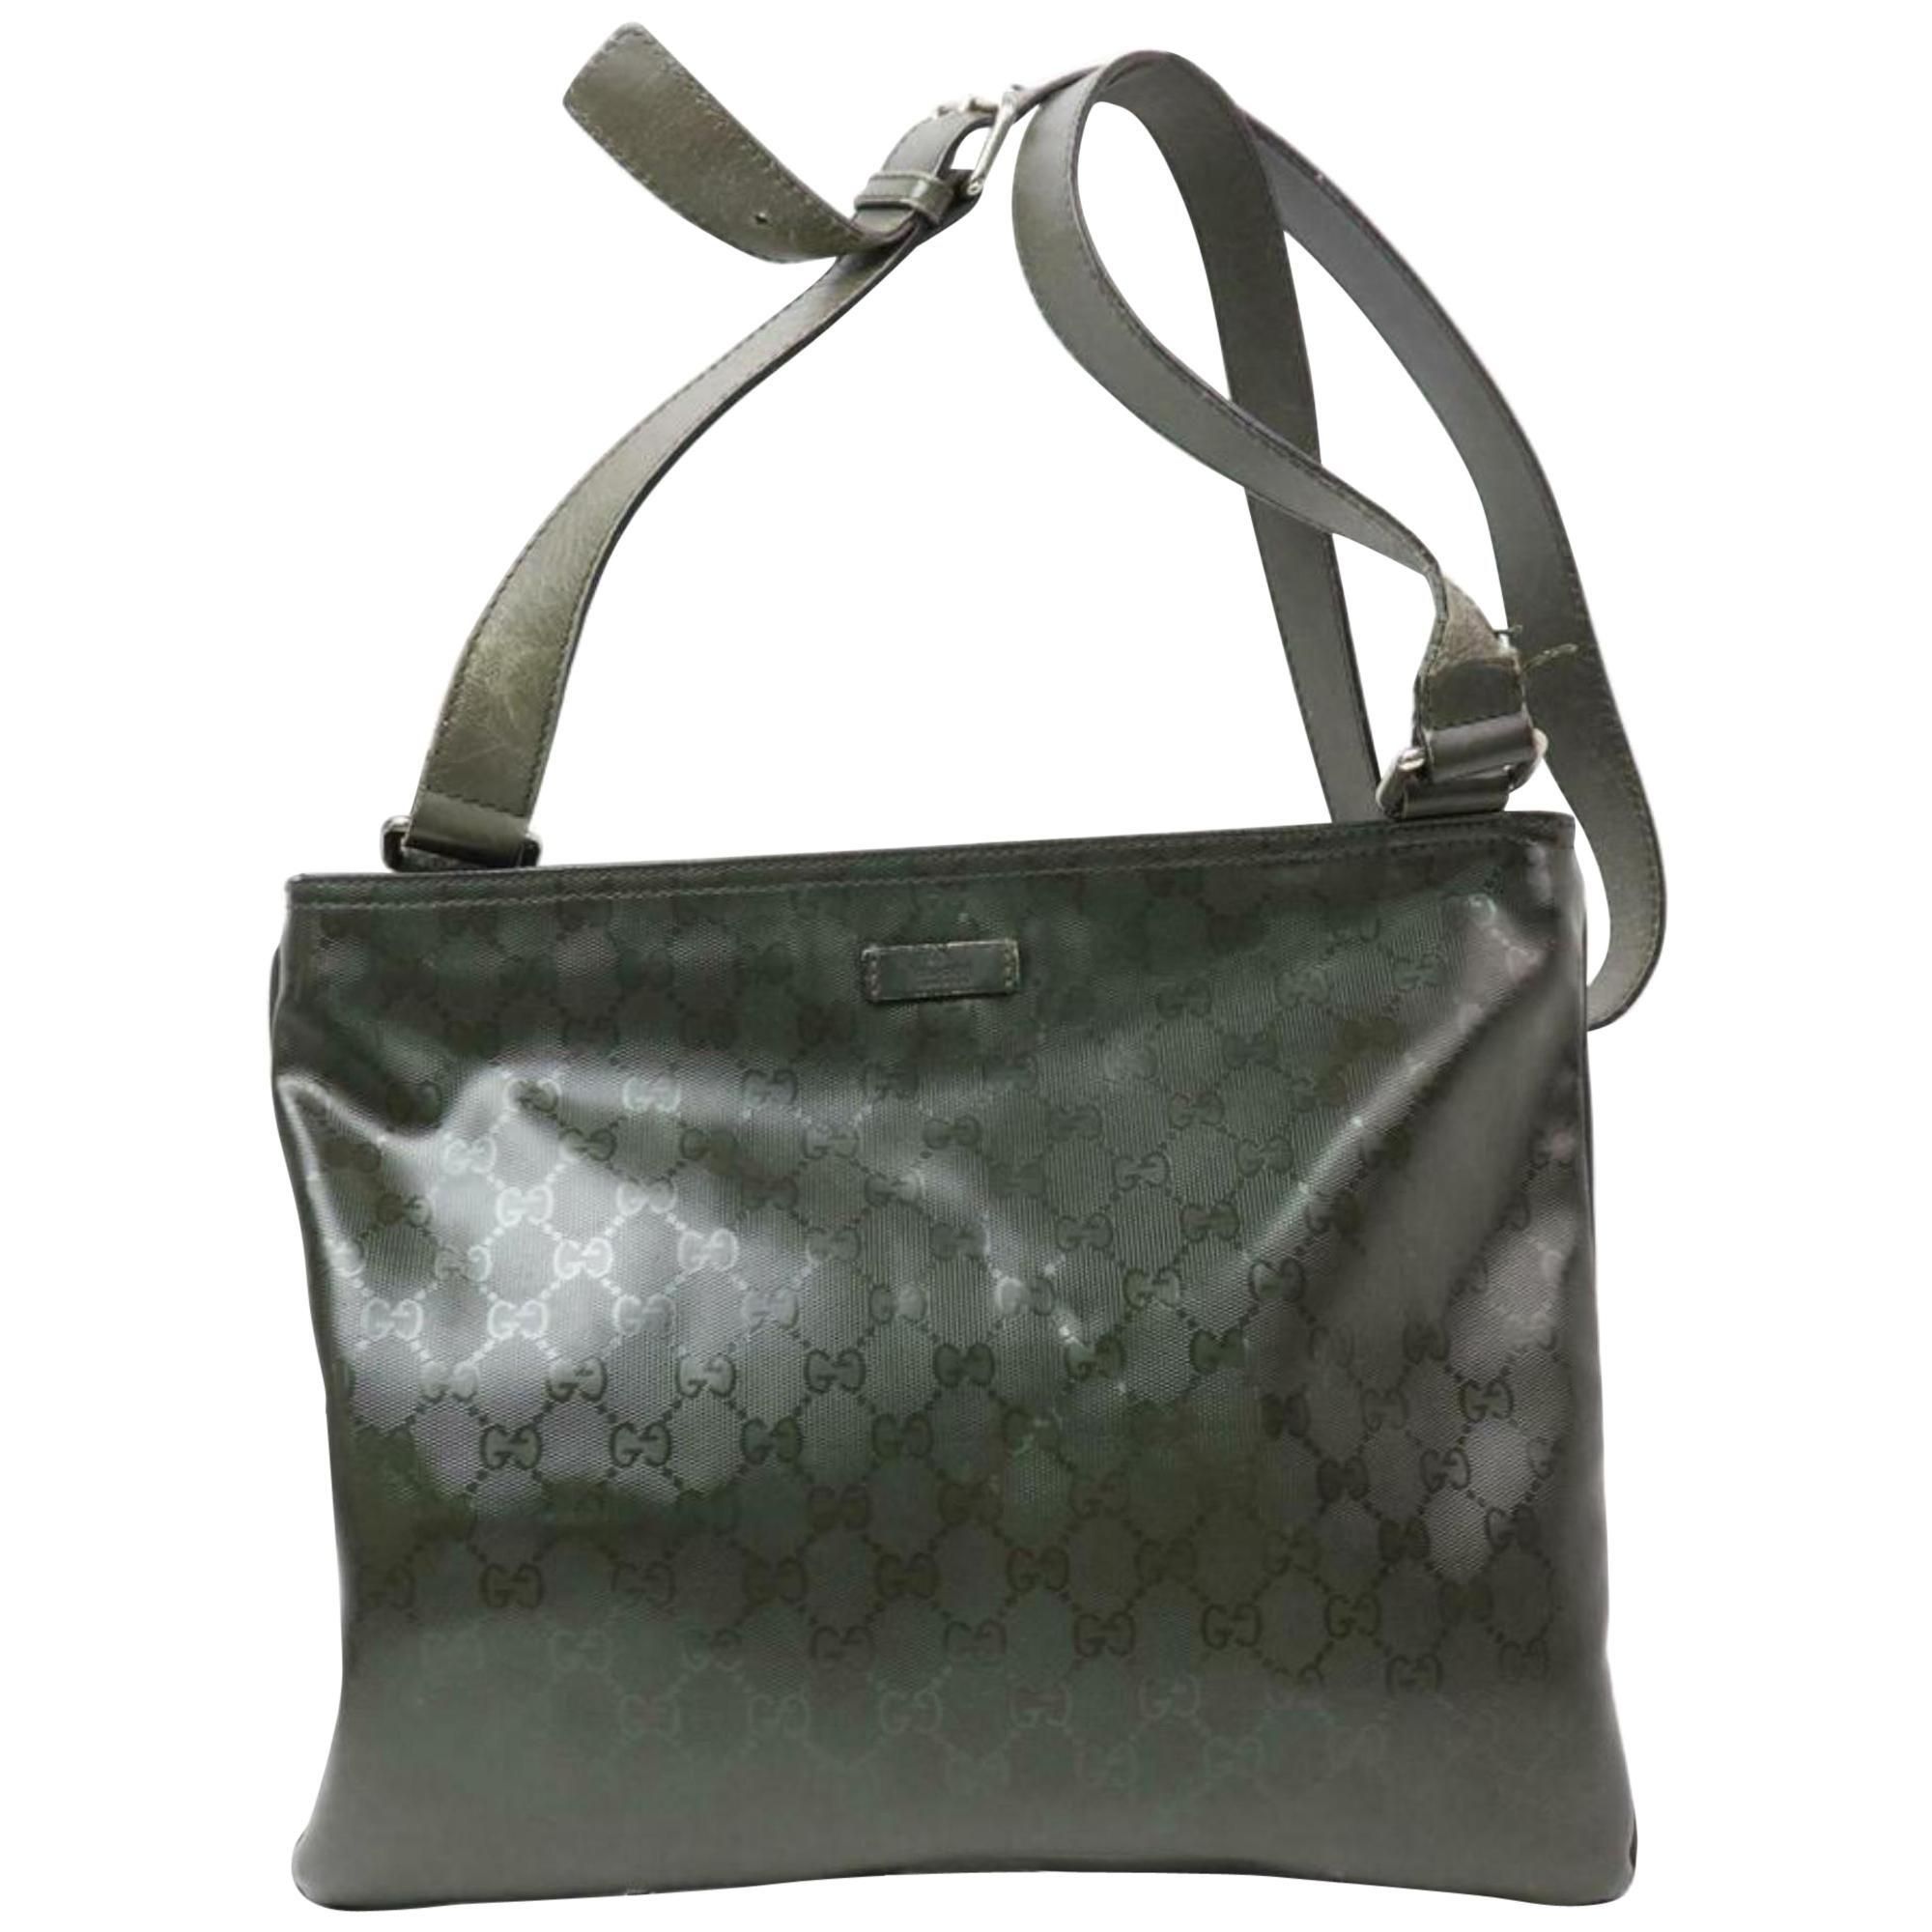 85e6fdbf85a7 Vintage Gucci Handbags and Purses - 2